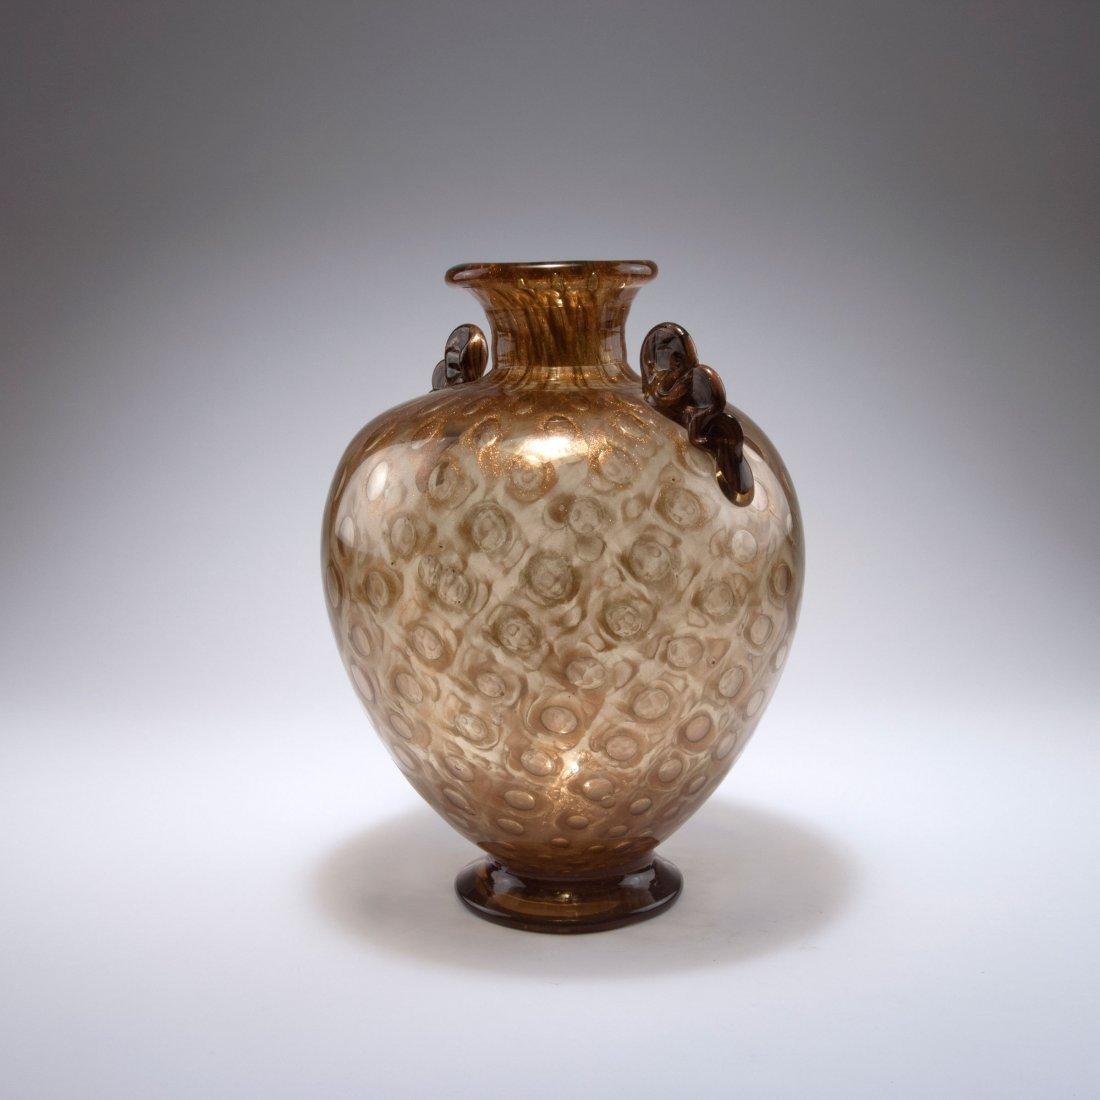 'Avventurina a bolle' vase with handles, c1936 - 2